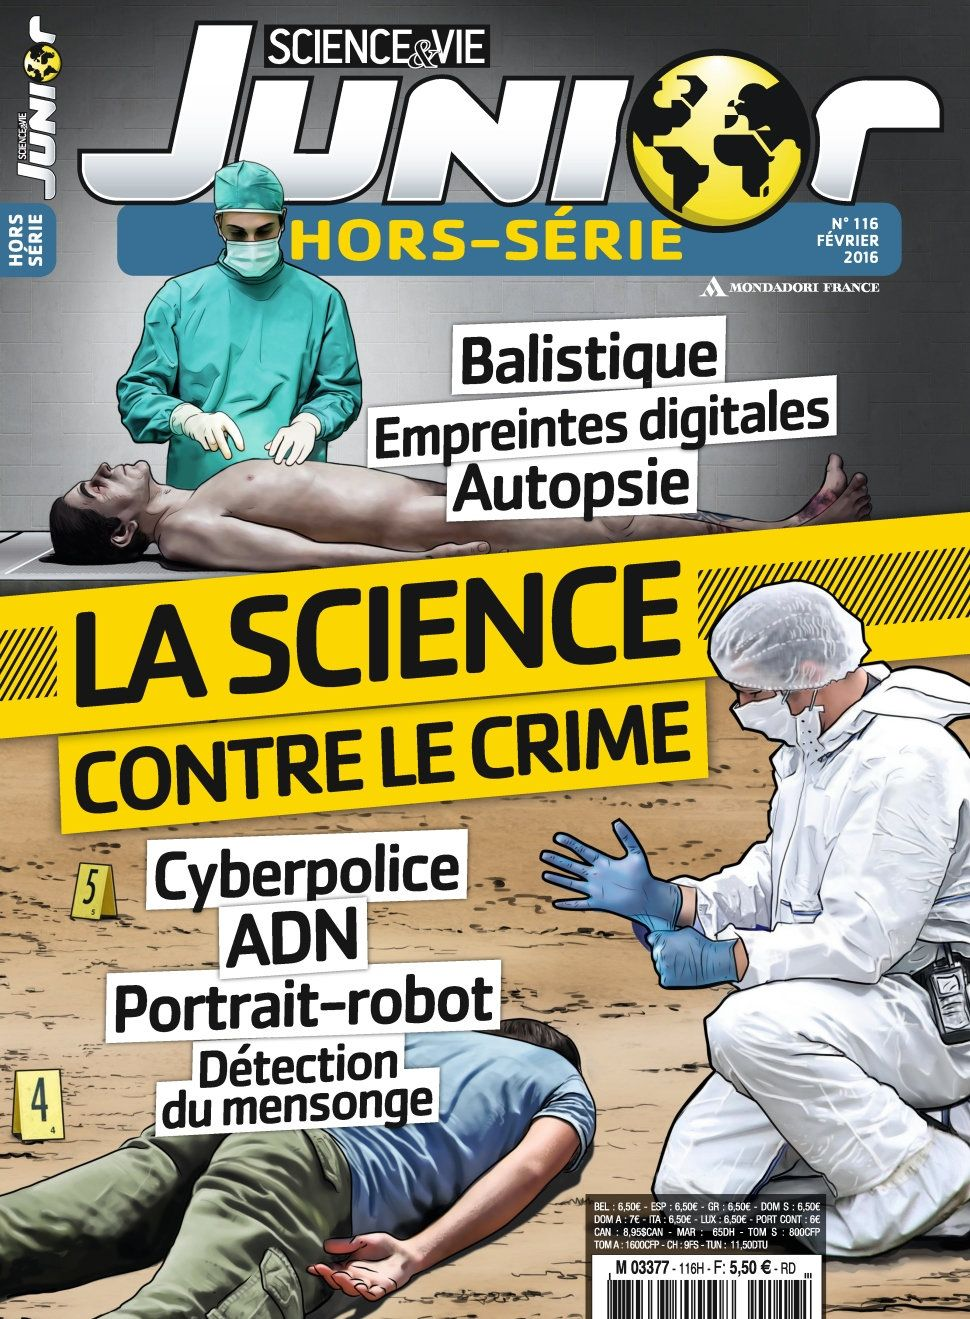 Science & Vie Junior Hors-Série 116 - Fevrier 2016